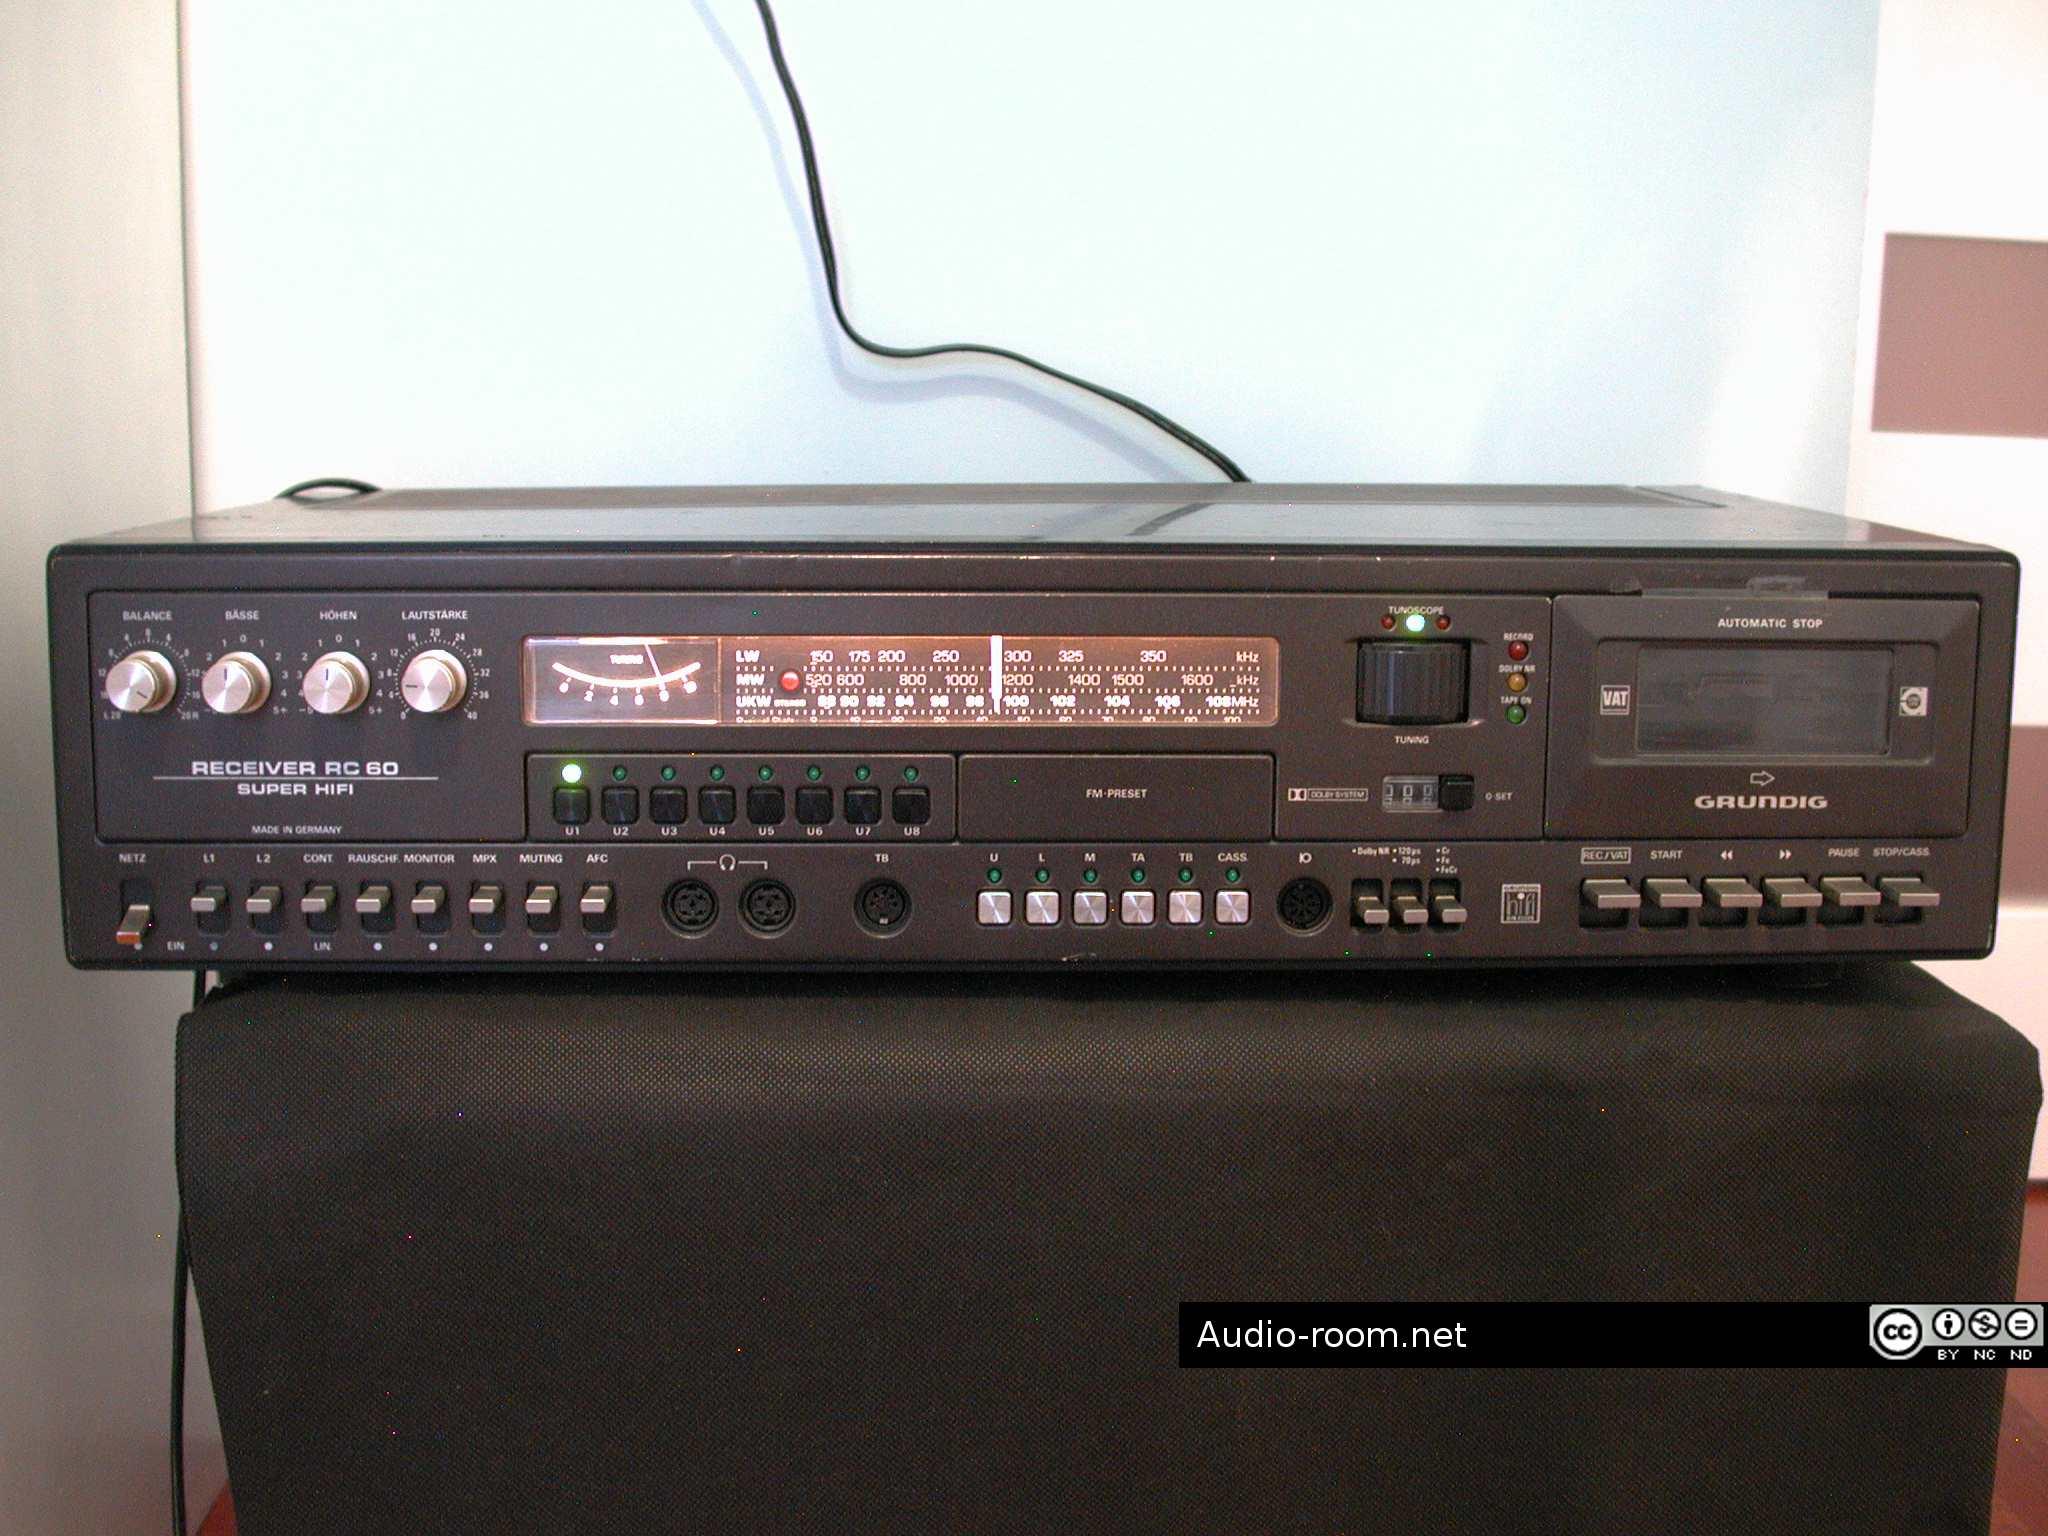 Grundig rc-60 - dscn2578